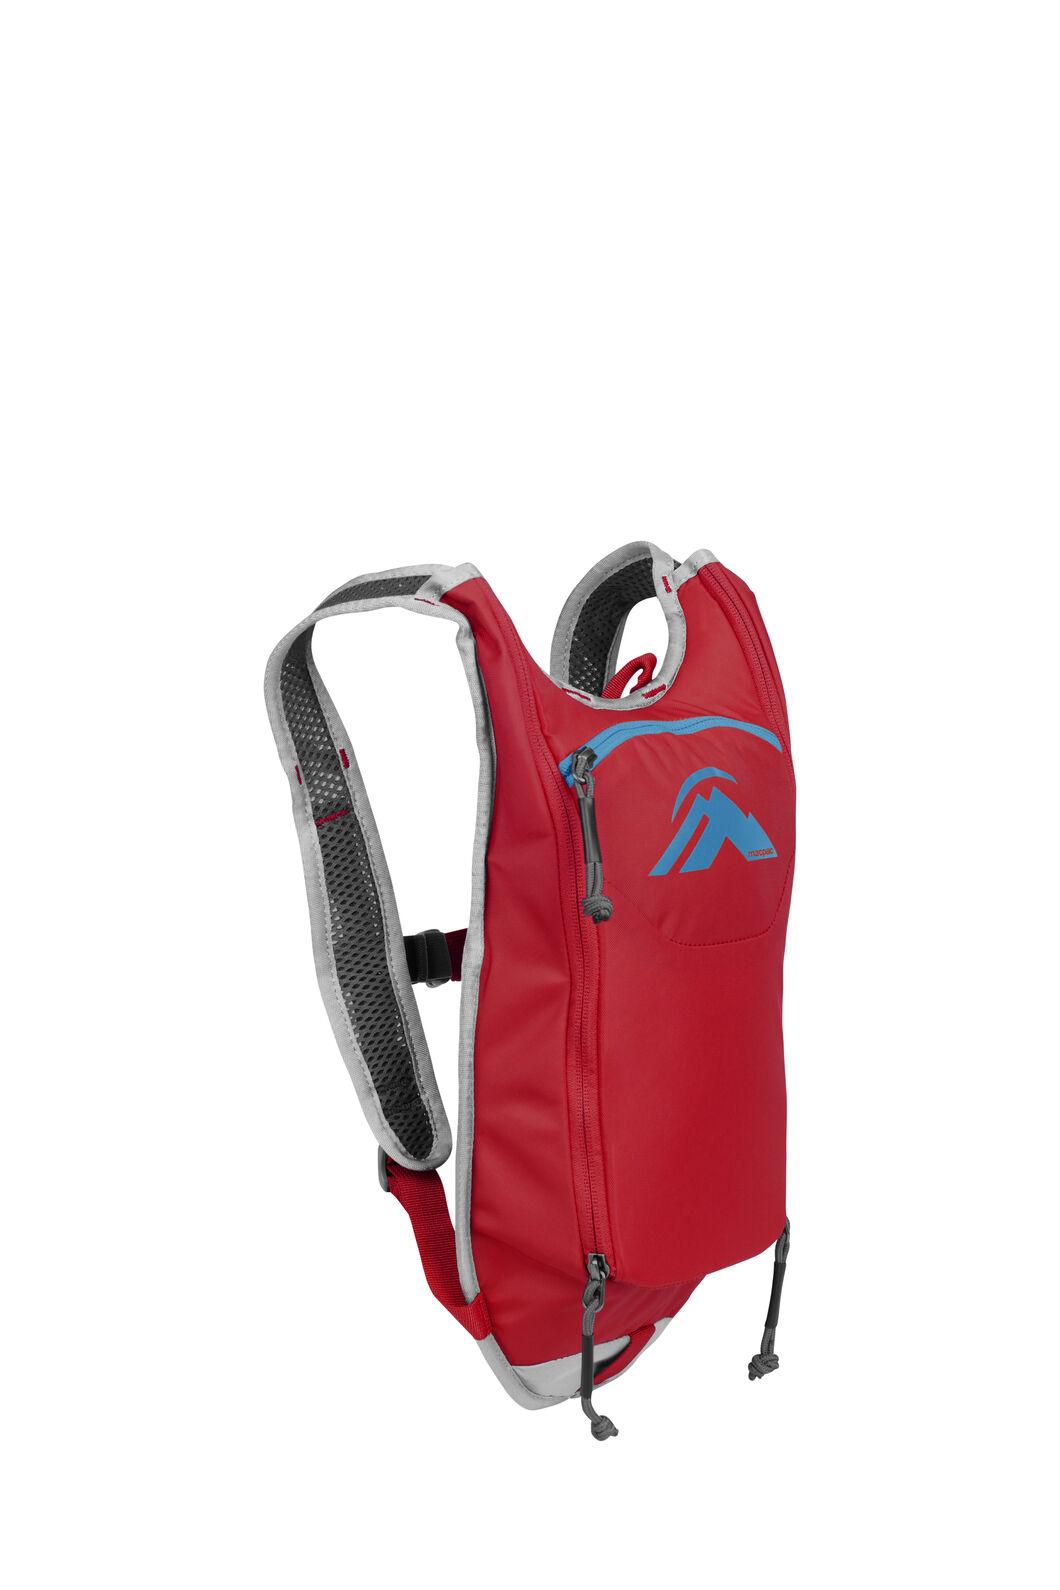 Macpac Milli-Amp H2O 1L Hydration Pack, Haute Red, hi-res